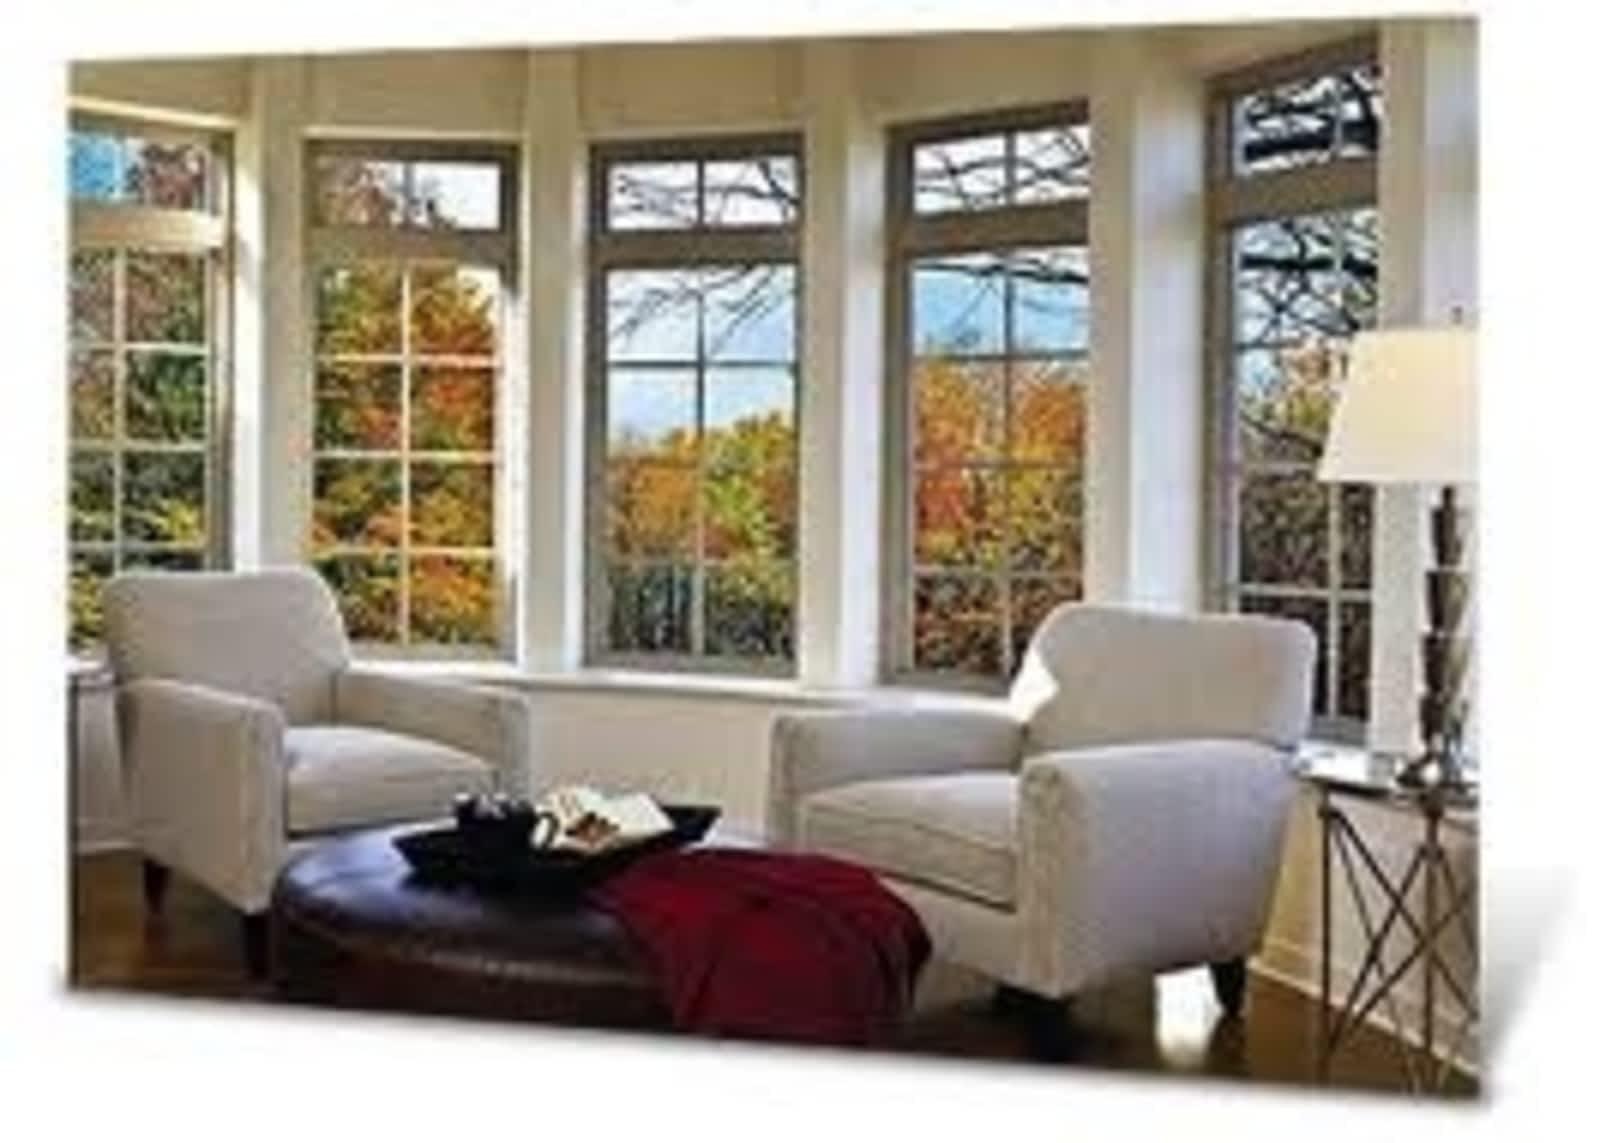 Comfort King Windows u0026 Doors Ltd - Opening Hours - 1521 Sieveright Rd Gloucester ON & Comfort King Windows u0026 Doors Ltd - Opening Hours - 1521 Sieveright ...